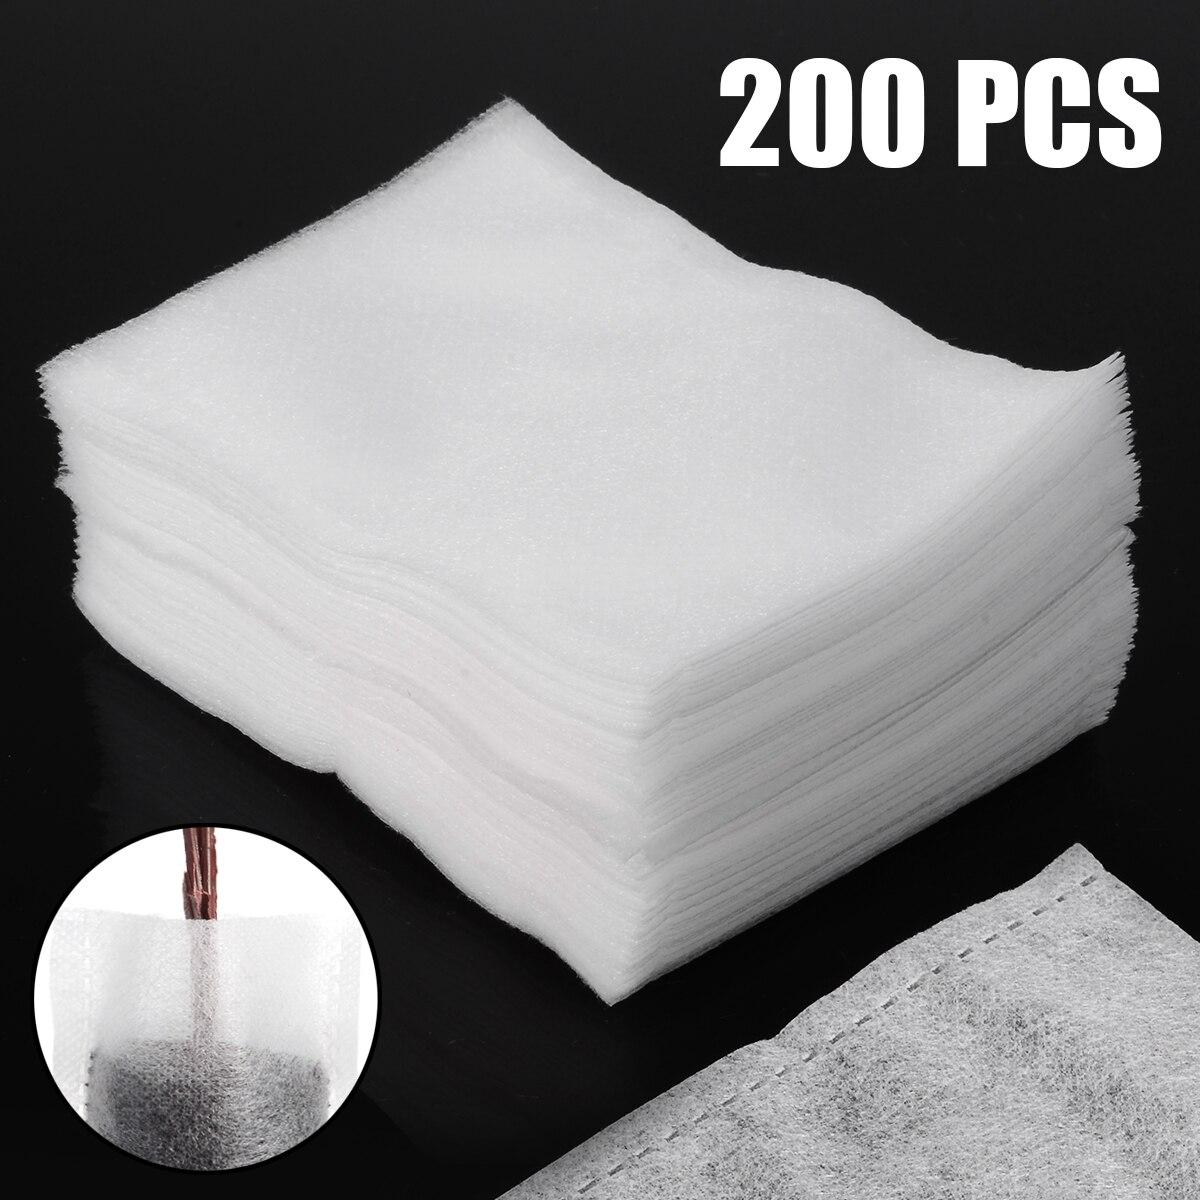 200pcs/lot New Biodegradable Non-woven Fabric Nursery Bags 8cm*10cm White Eco-friendly Flower Plant Grow Bags Seedling Pots